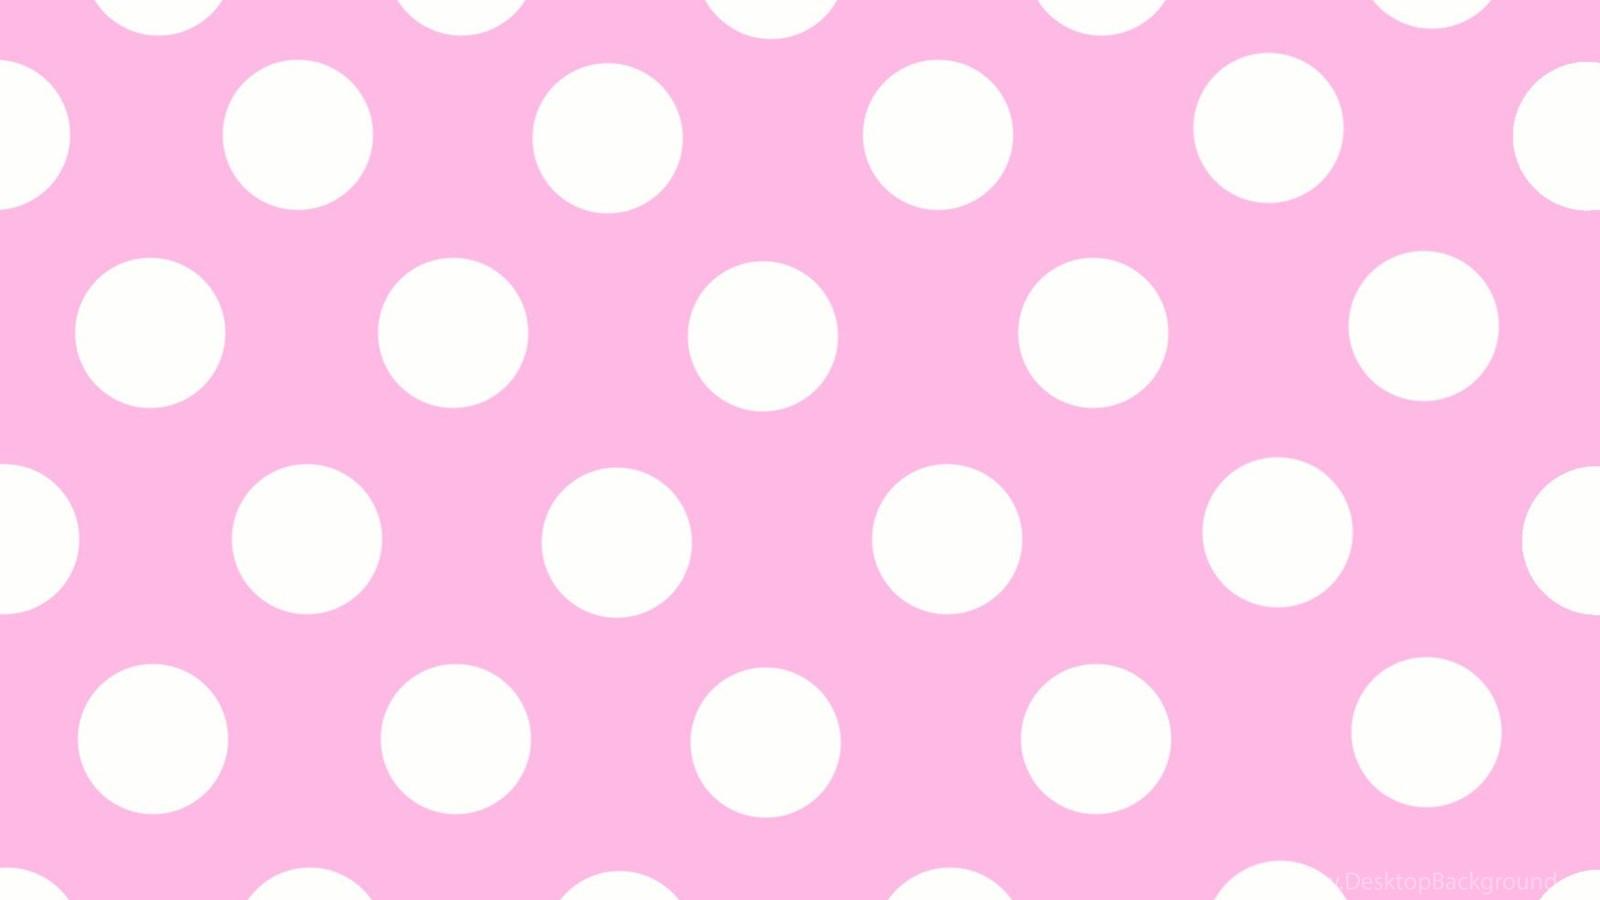 pink polka dot wallpapers hd wallpapers pretty desktop